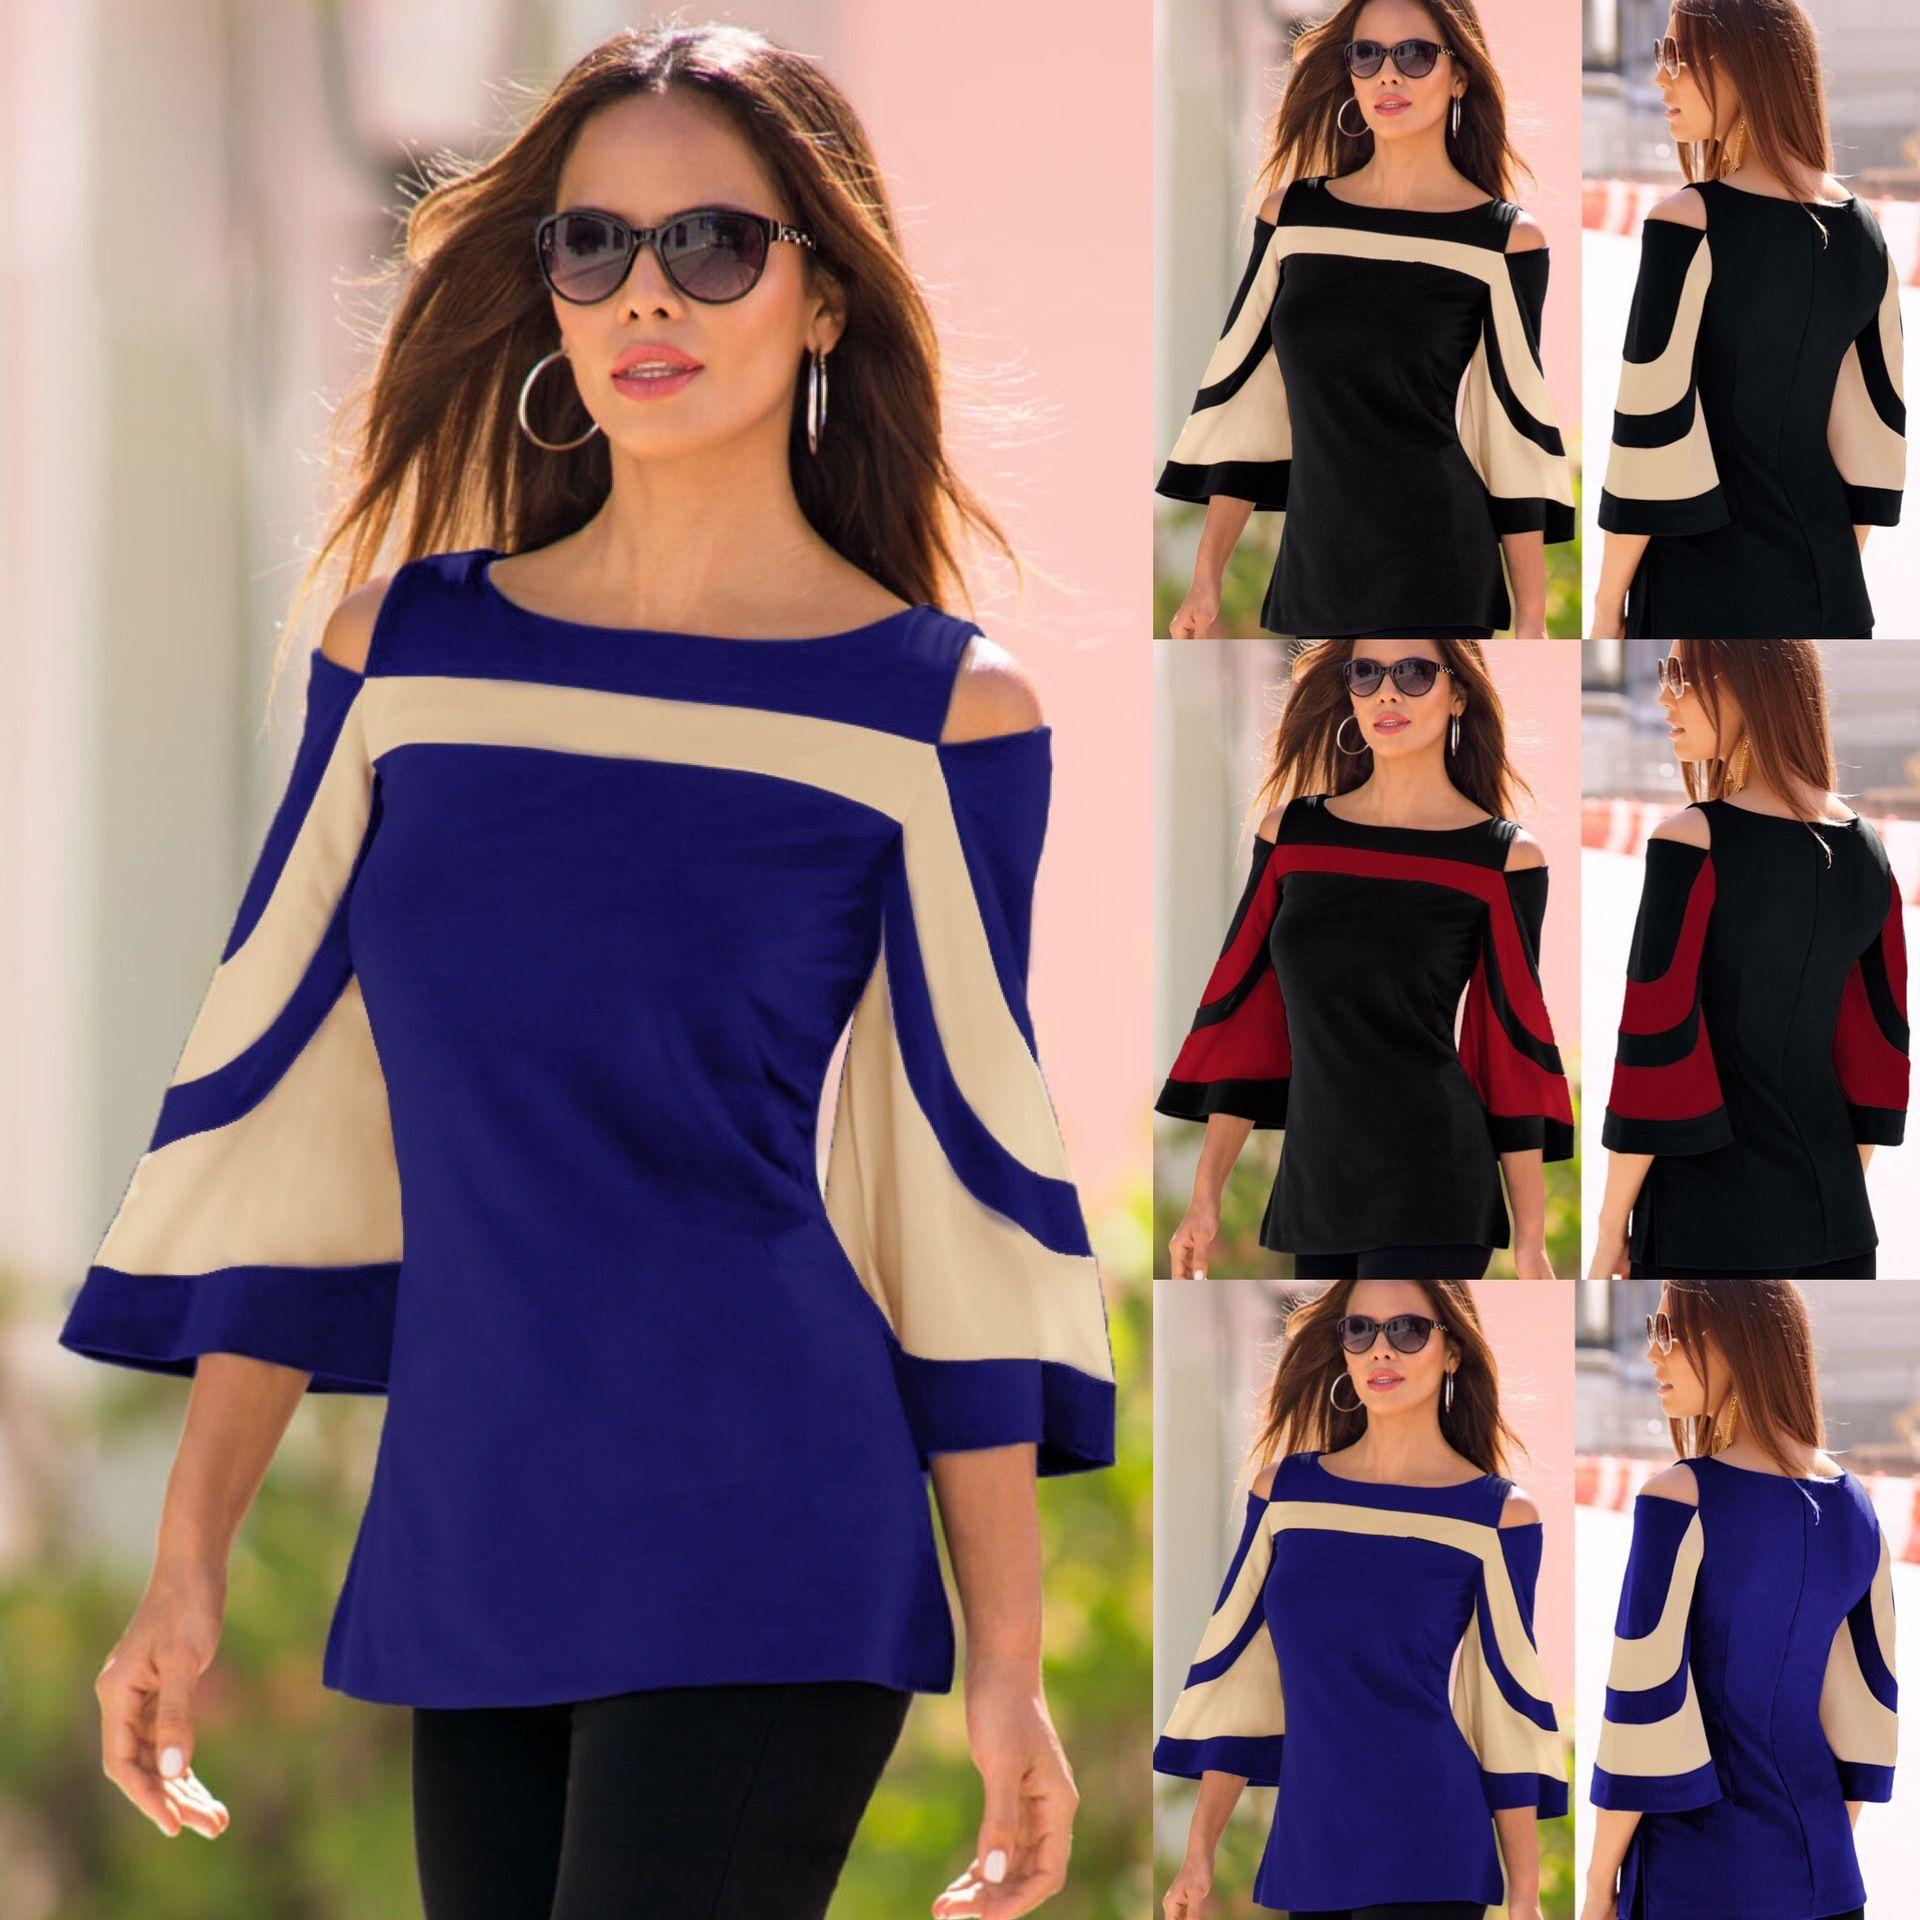 6bfdec3c Women luxury Blous T Shirts Tops Sweatshirts strapless bat sleeve fashion  Casual Sexy Round Collar Tees sweatshirts sweater Women's Clothing